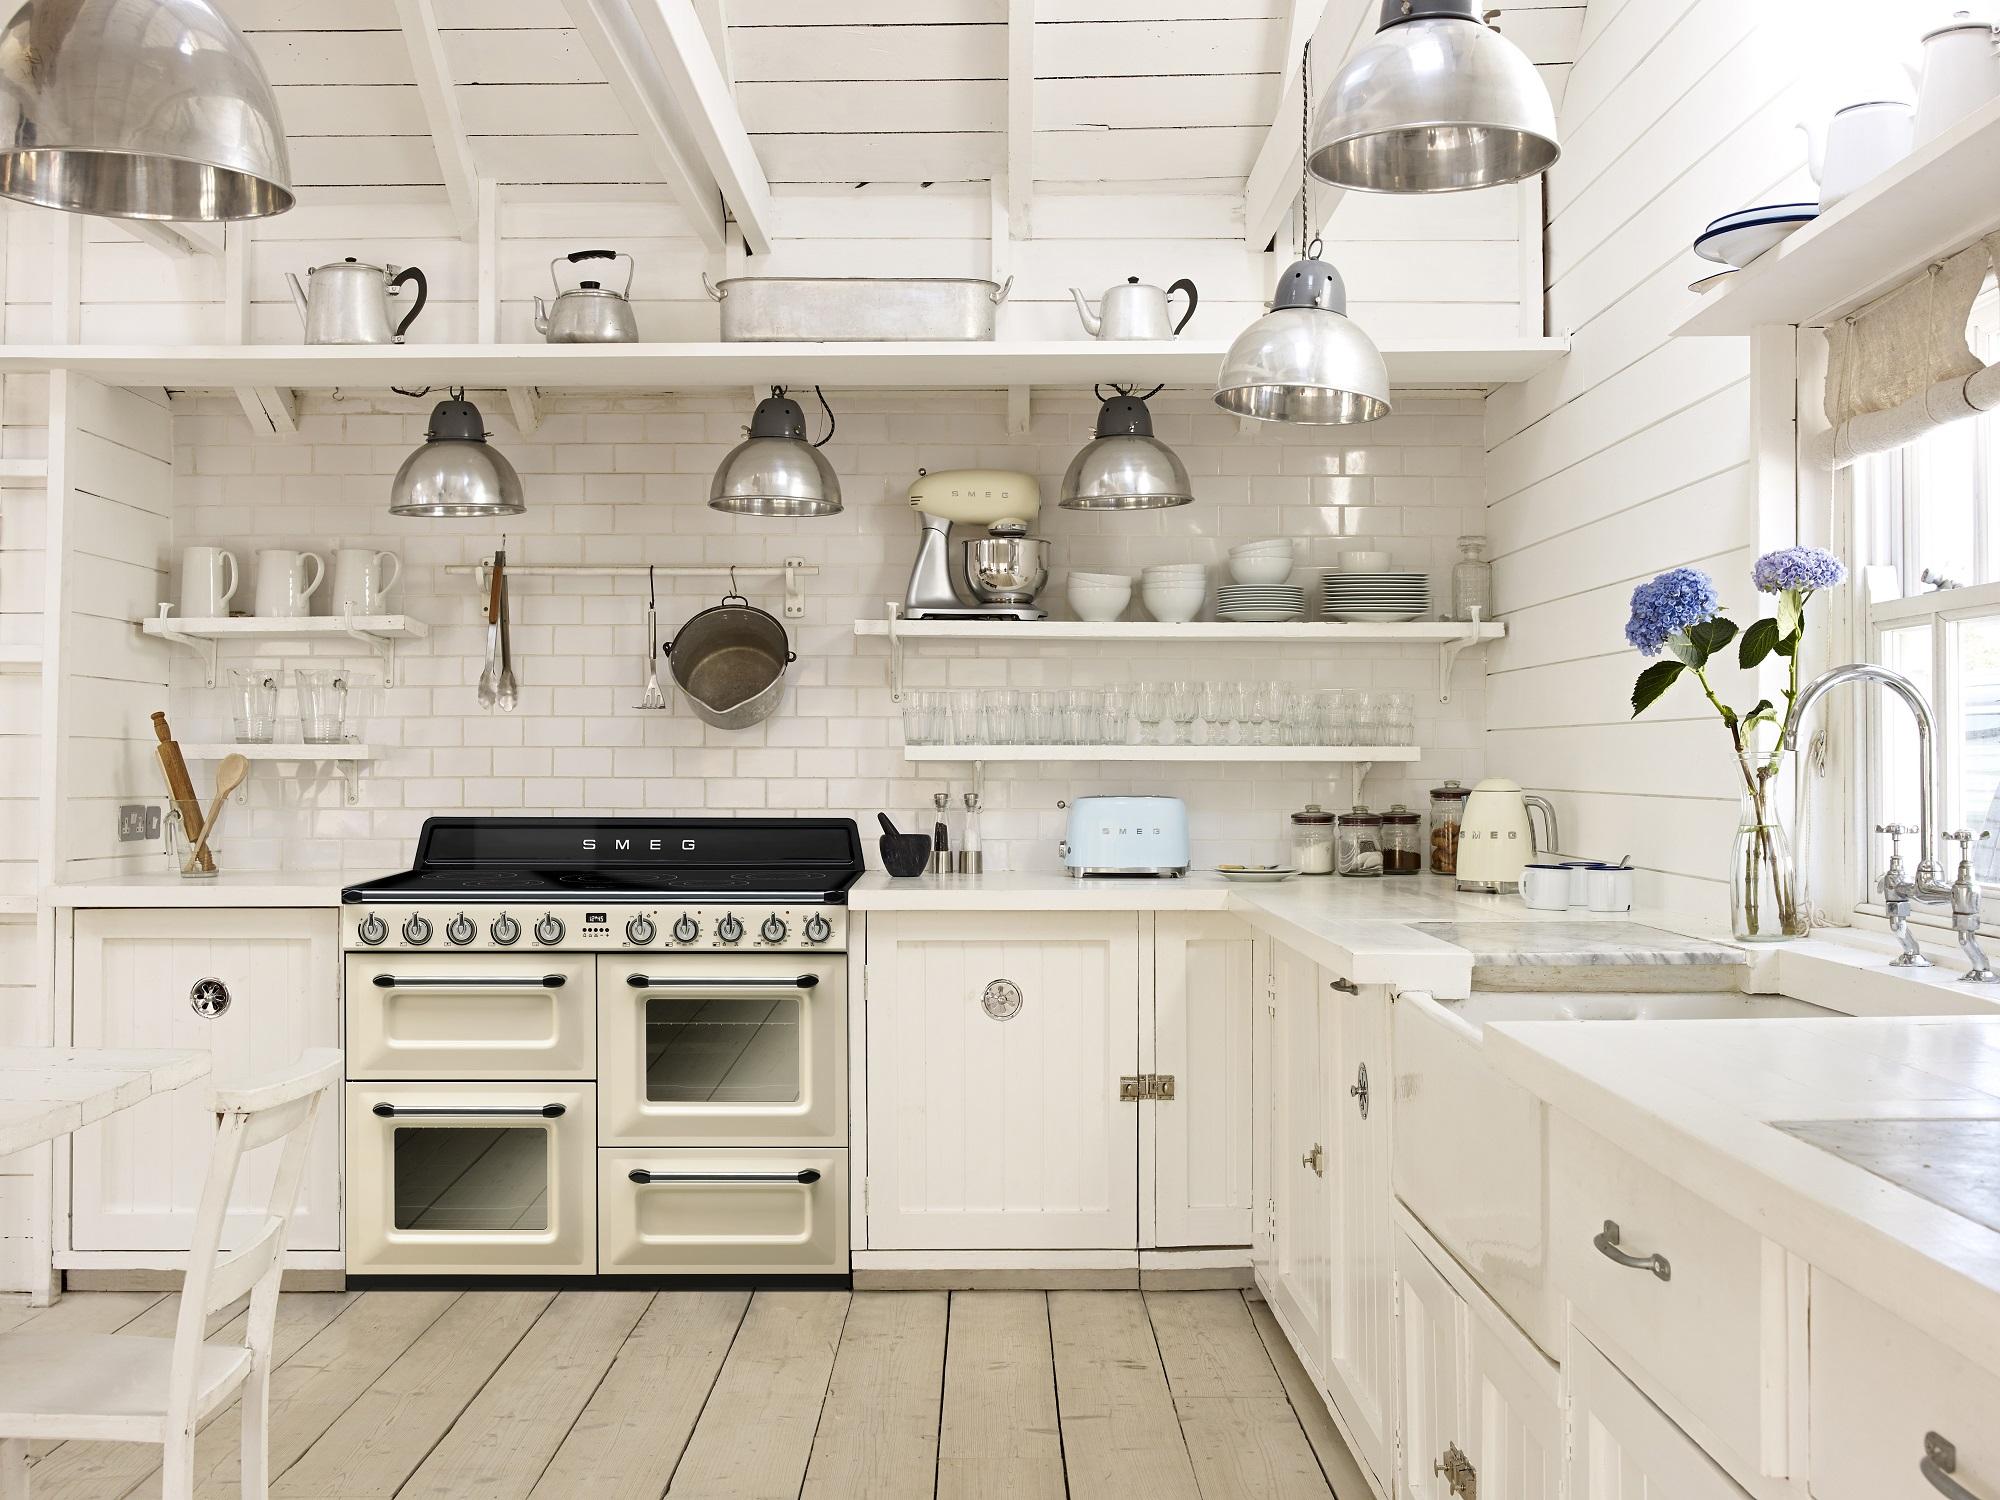 smeg keukenapparatuur in jaren 50 stijl nieuws. Black Bedroom Furniture Sets. Home Design Ideas